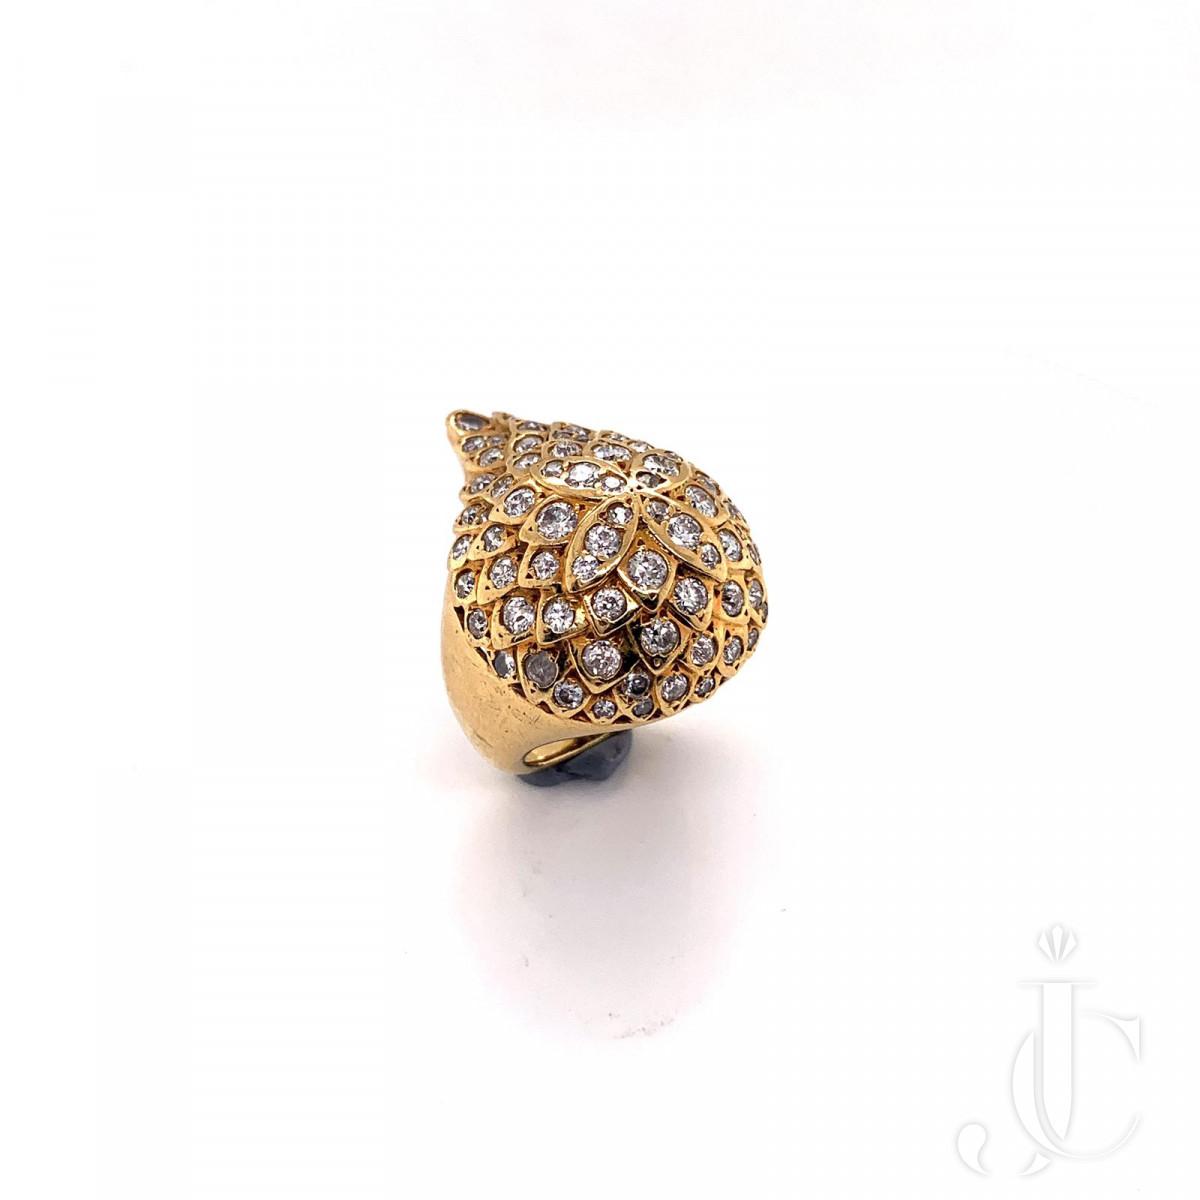 An 18k gold diamond ring by Belperron